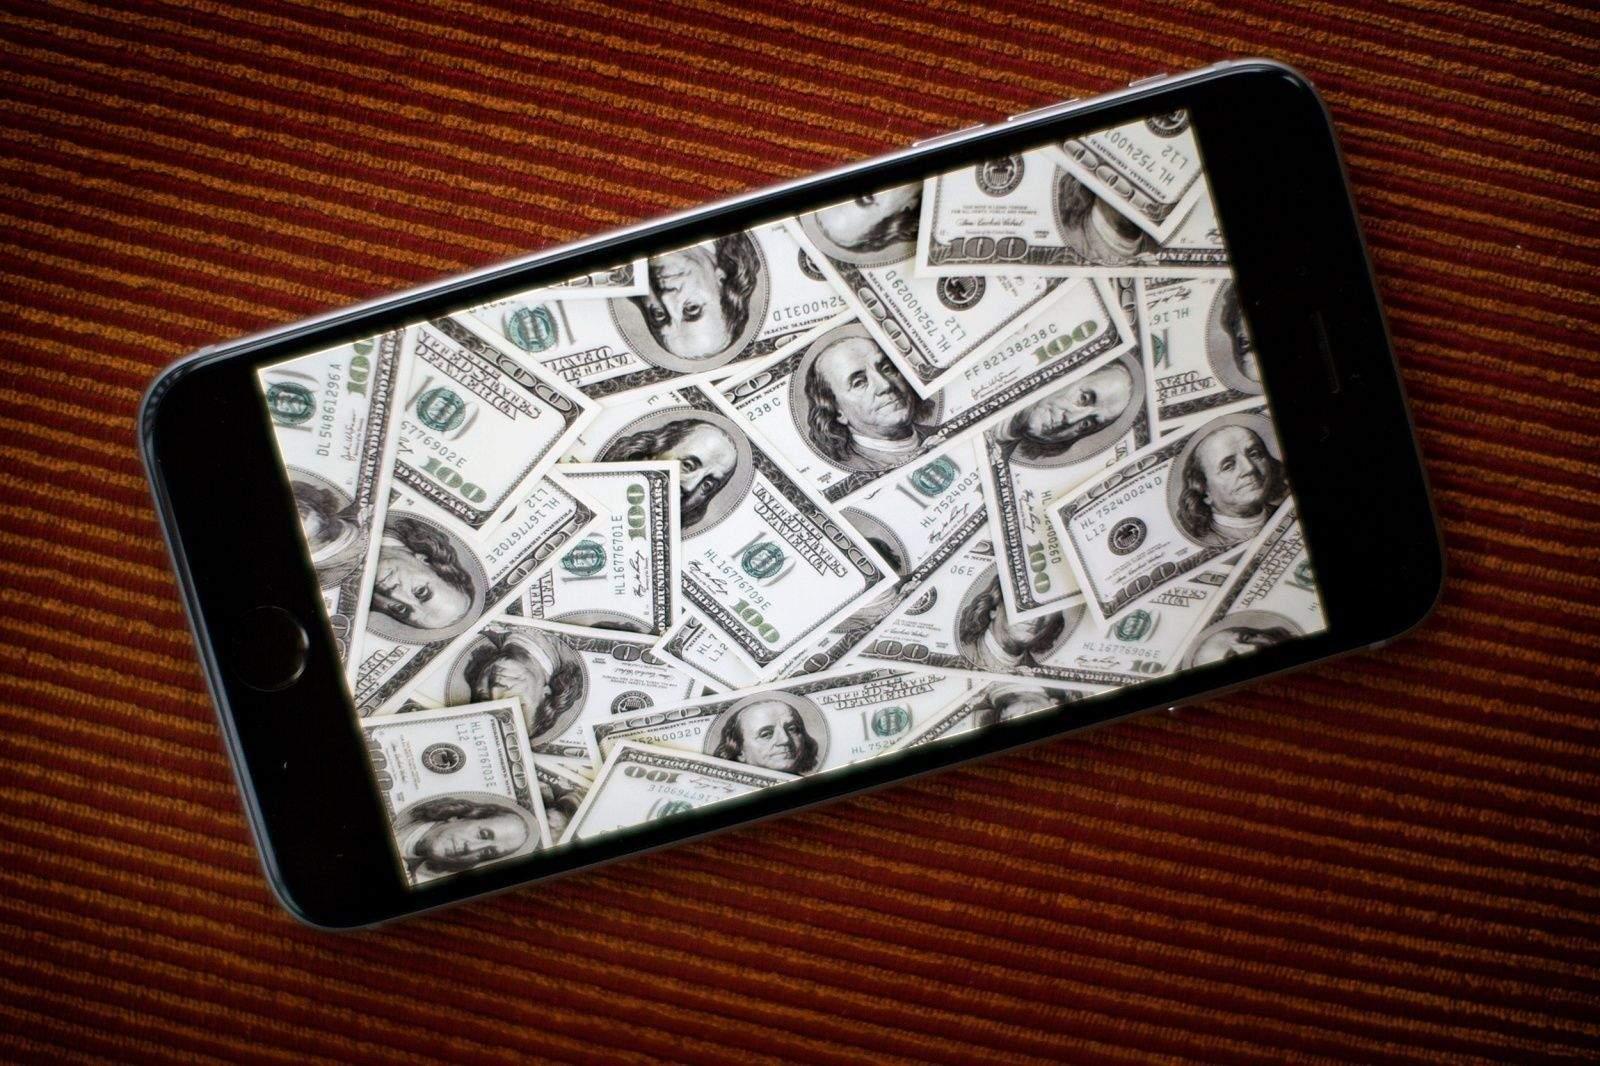 Apple raked in the cash last quarter.